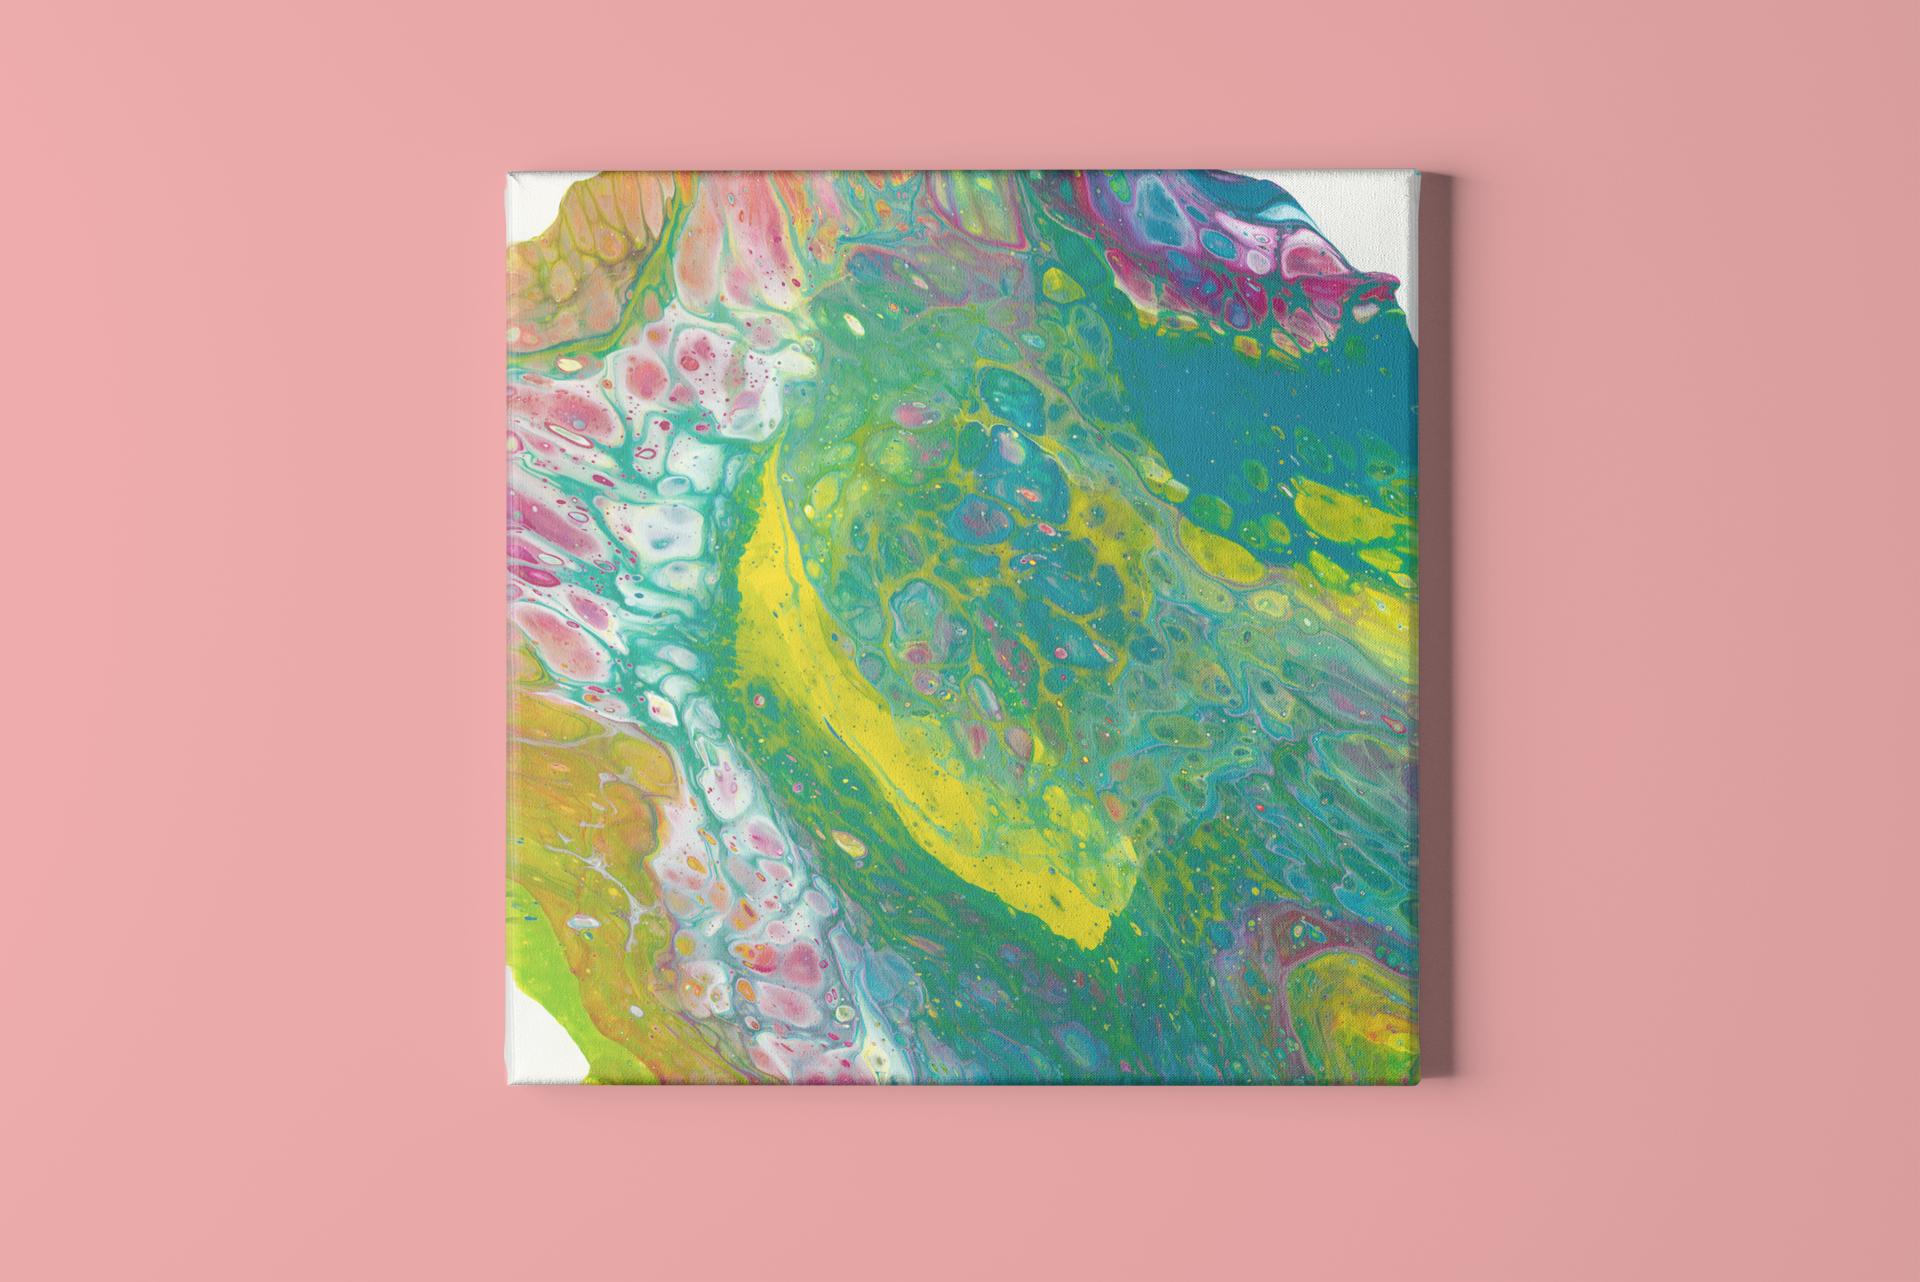 minimalistic-mockup-of-a-squared-canvas-on-a-plain-wall-2520-el1.png